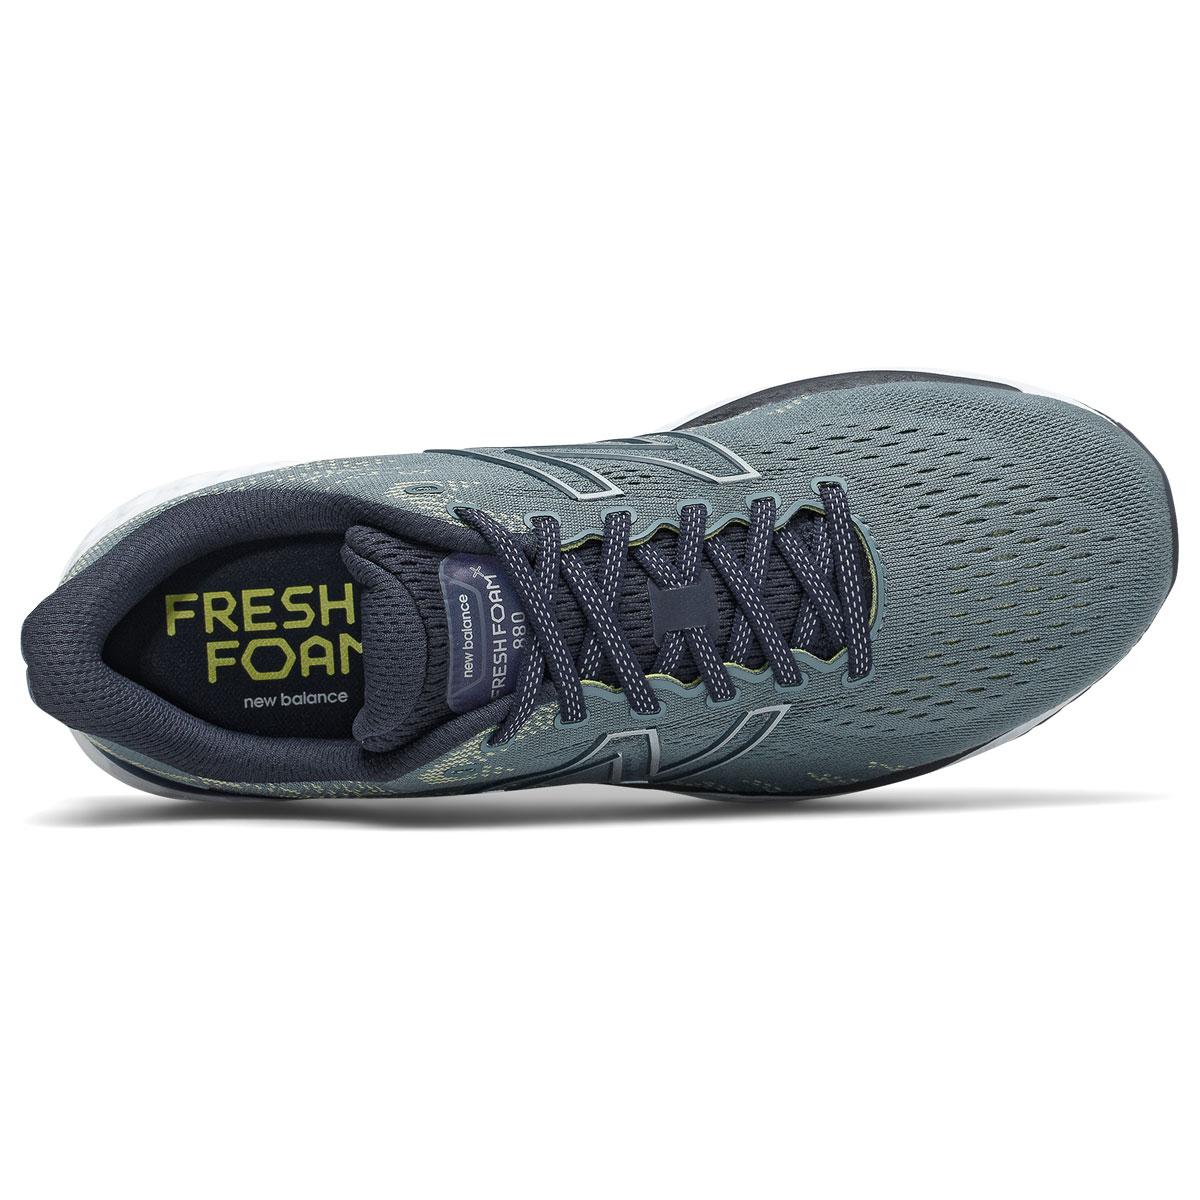 Men's New Balance Fresh Foam 880v11 Running Shoe - Color: Ocean Grey/First Light - Size: 7 - Width: Wide, Ocean Grey/First Light, large, image 3